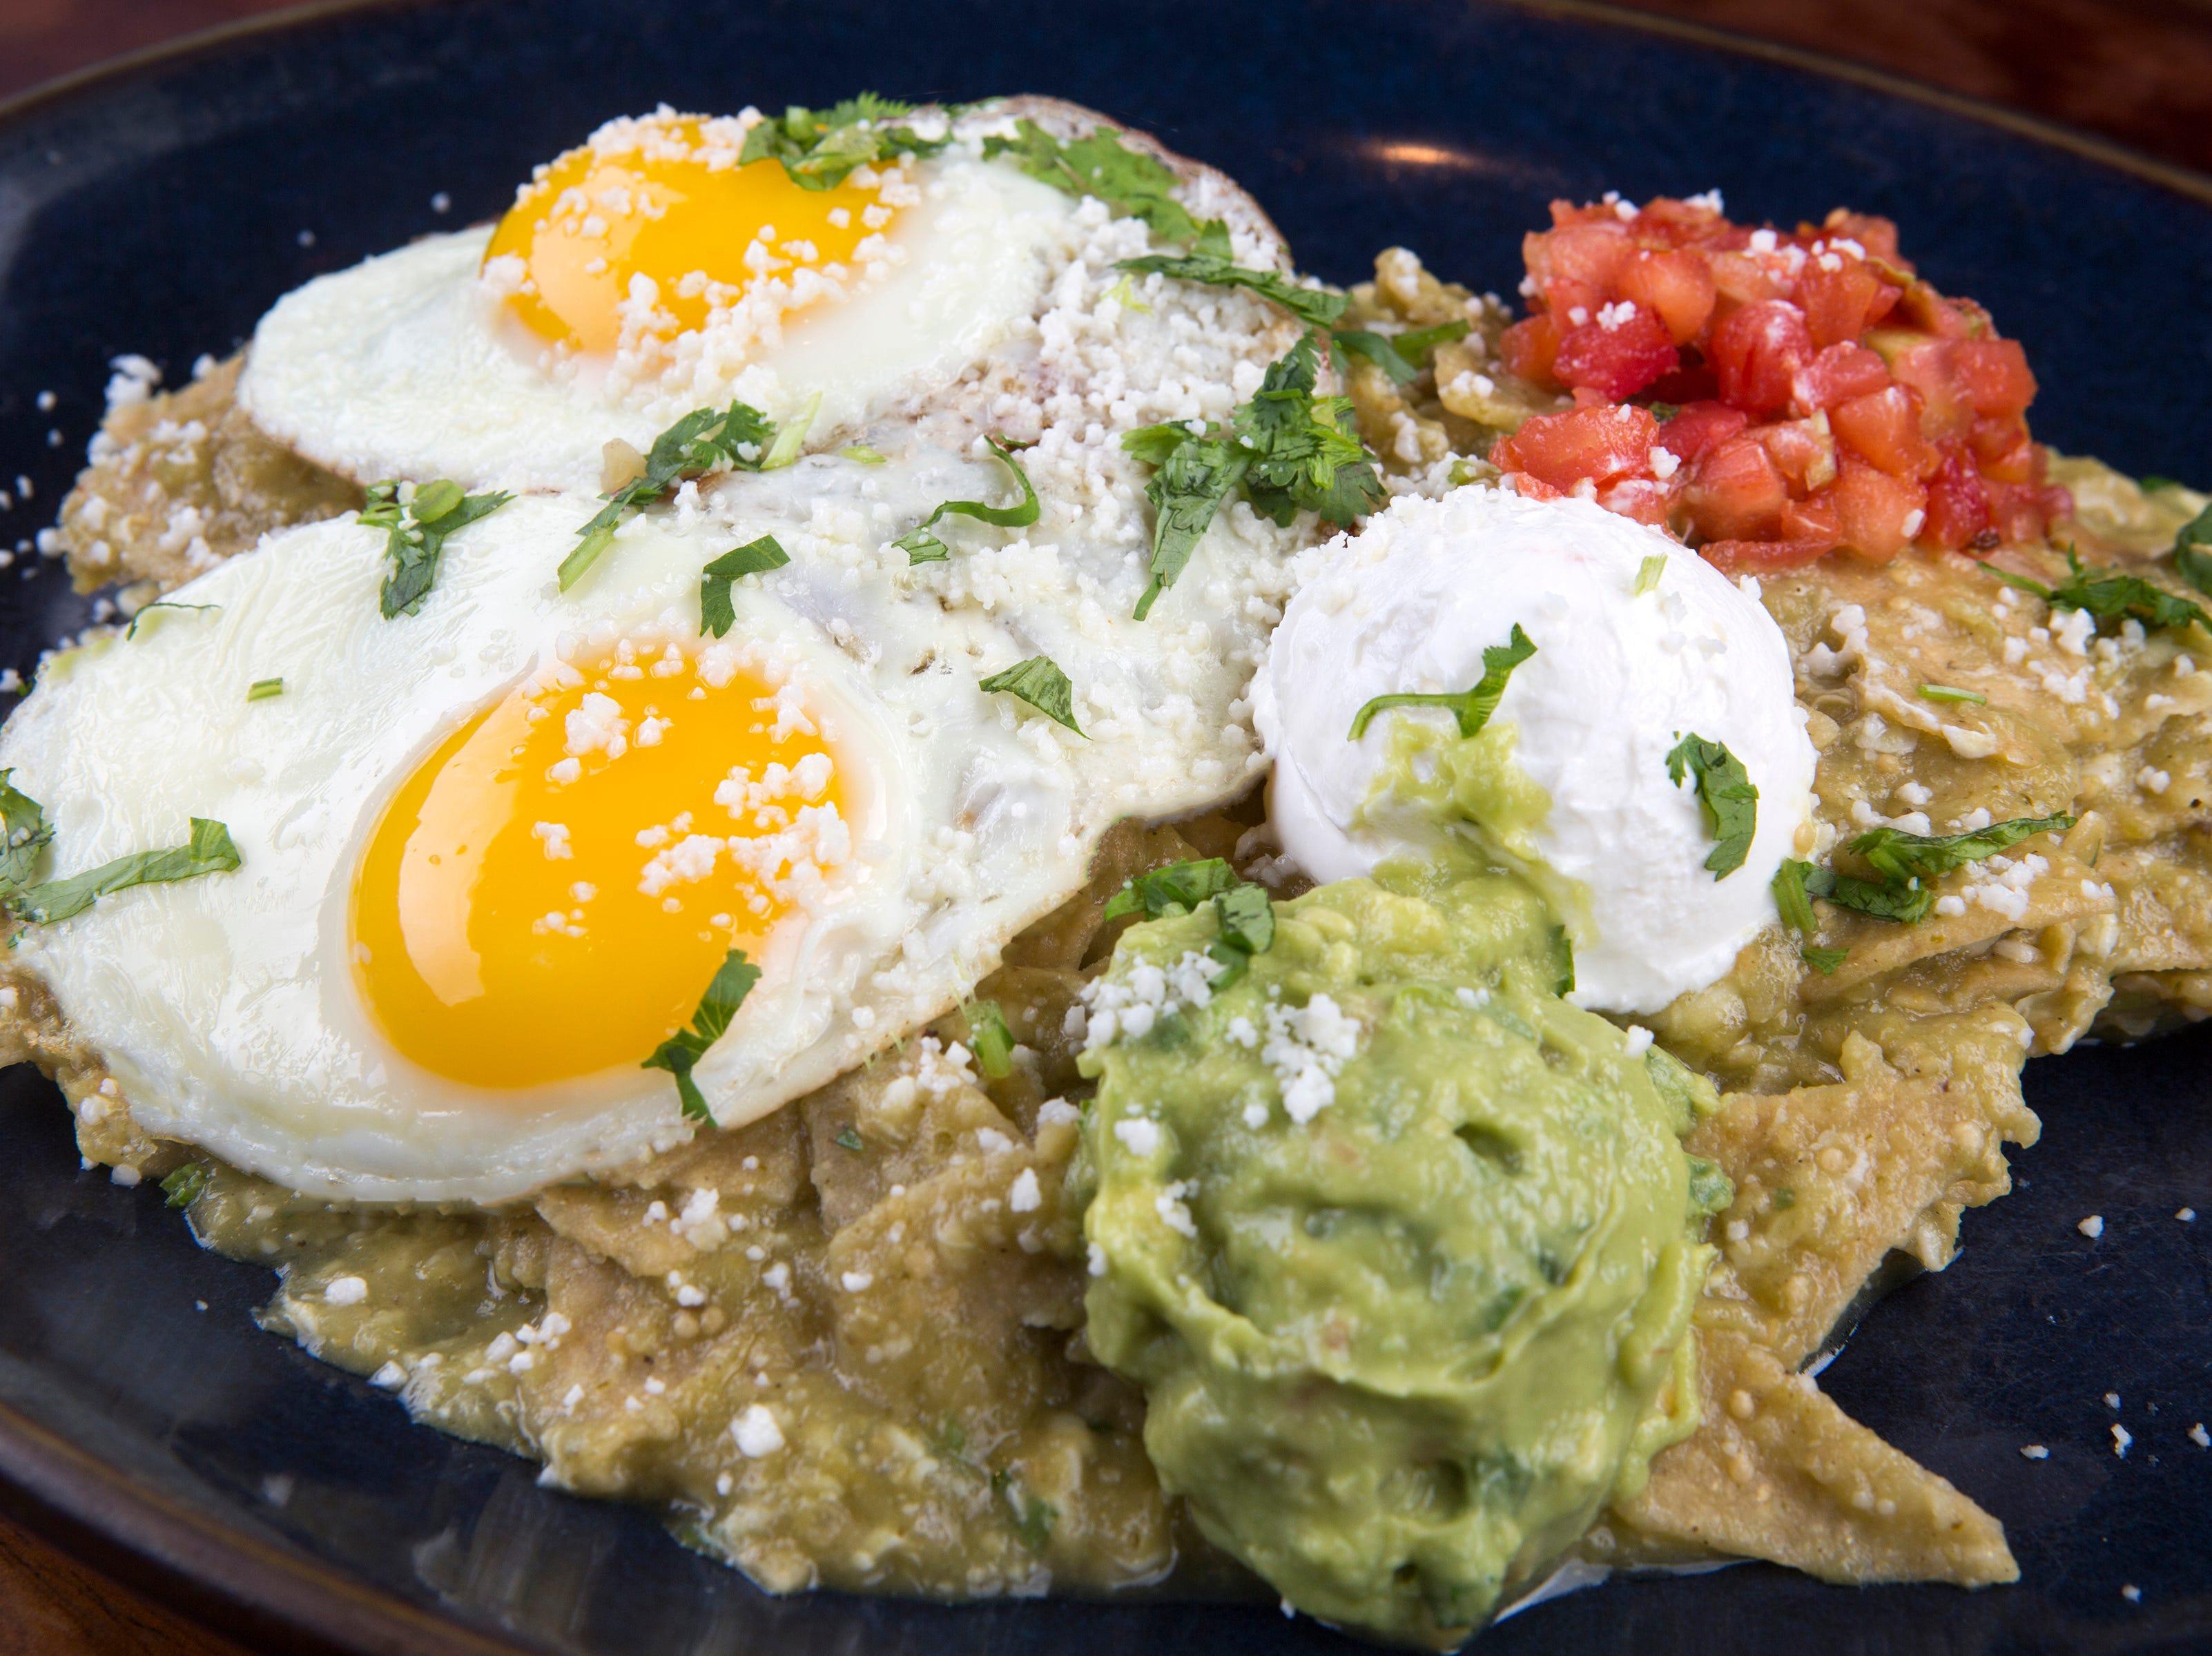 Huevos Rancheros Divorciados for brunch at Rocco's Tacos features sunny-side-up eggs on tostadas, refried beans, salsa roja, salsa verde, cotija cheese, pico de gallo, sour cream and guacamole.